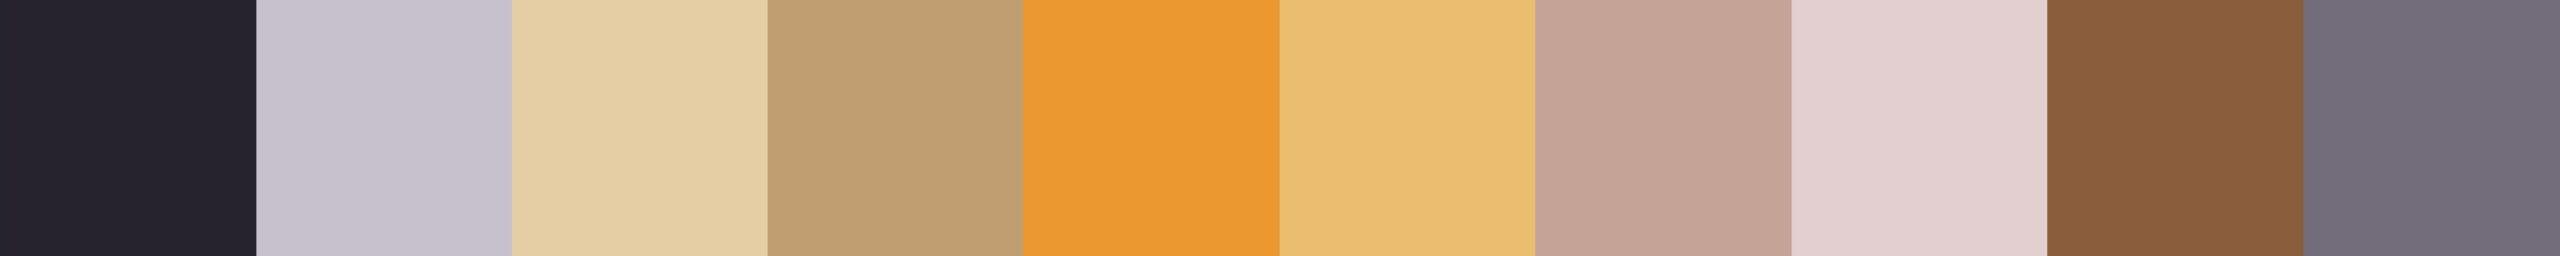 455 Kyrama Color Palette